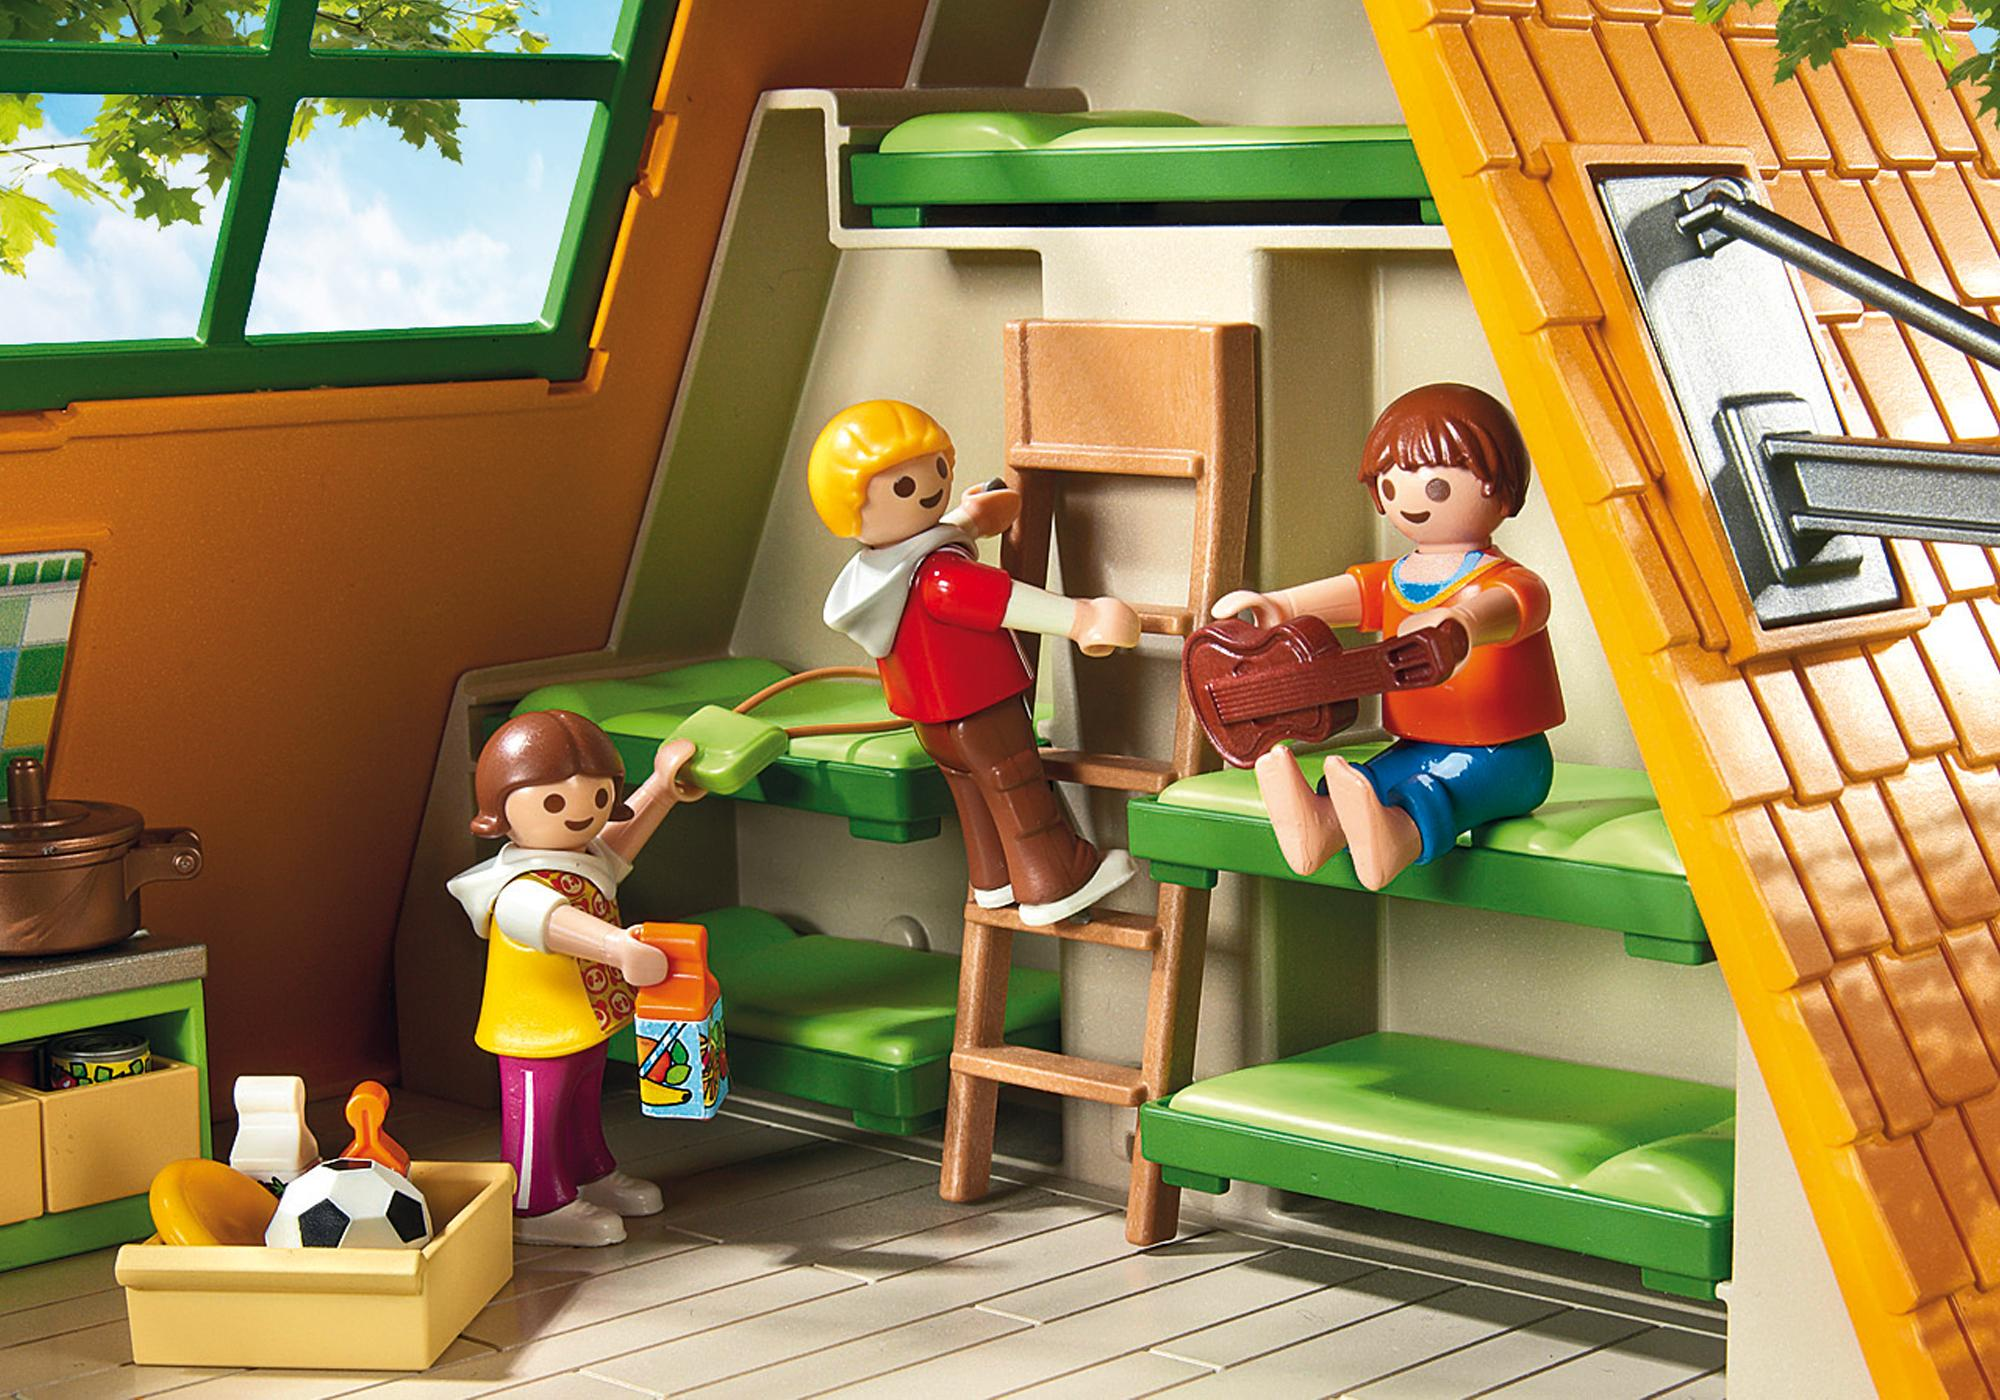 http://media.playmobil.com/i/playmobil/6887_product_extra2